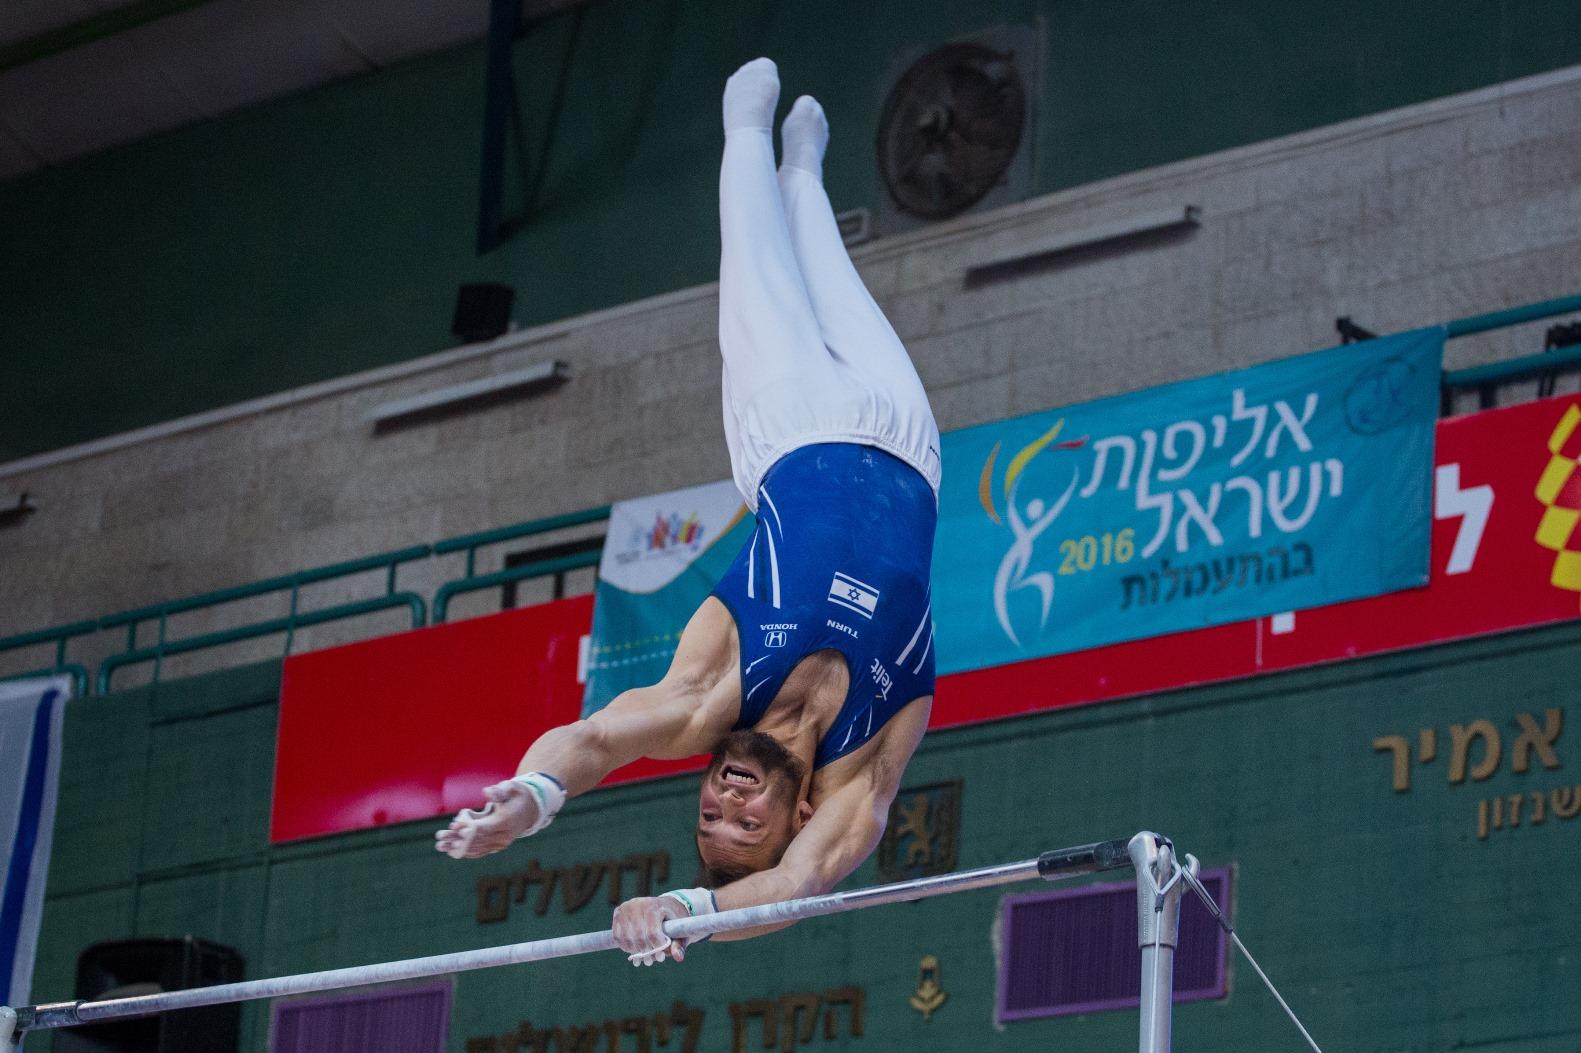 Alex Shatilov performing on the high bar during the Israel gymnastics championship in Jerusalem, April 6, 2016. Photo by Yonatan Sindel/FLASH90